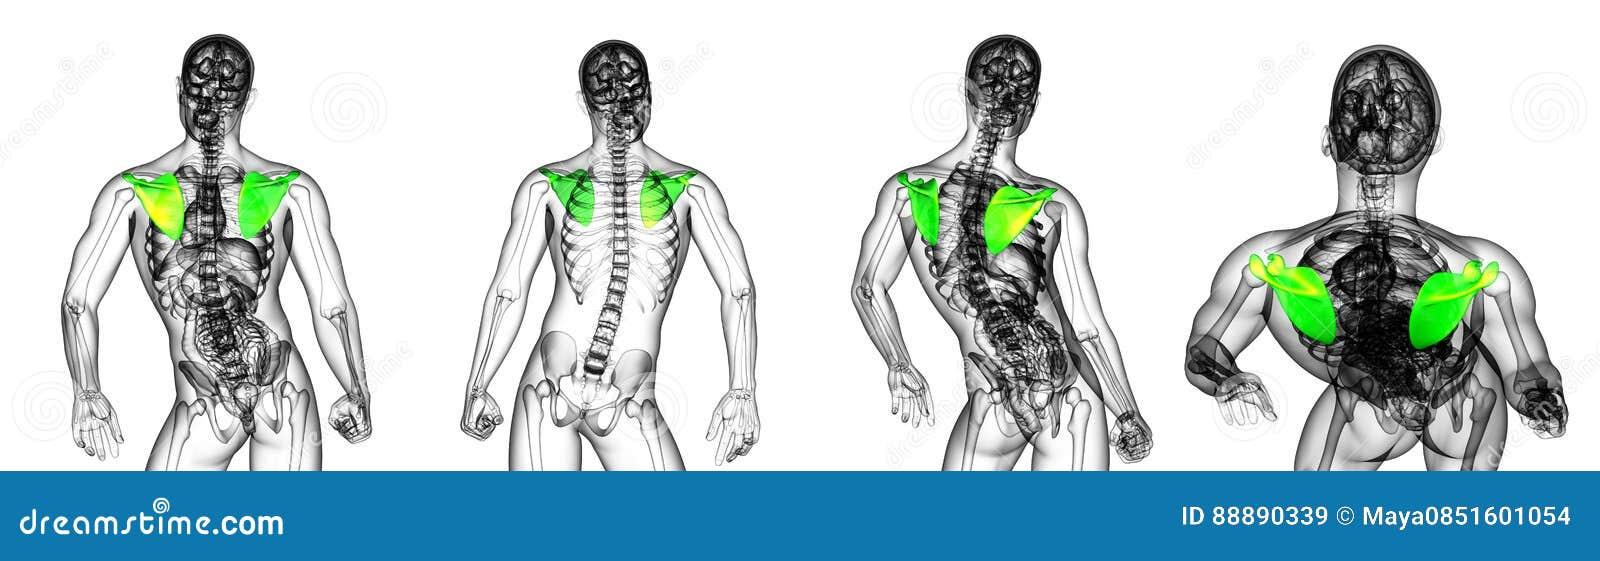 Schulterblattknochen stock abbildung. Illustration von schulterblatt ...